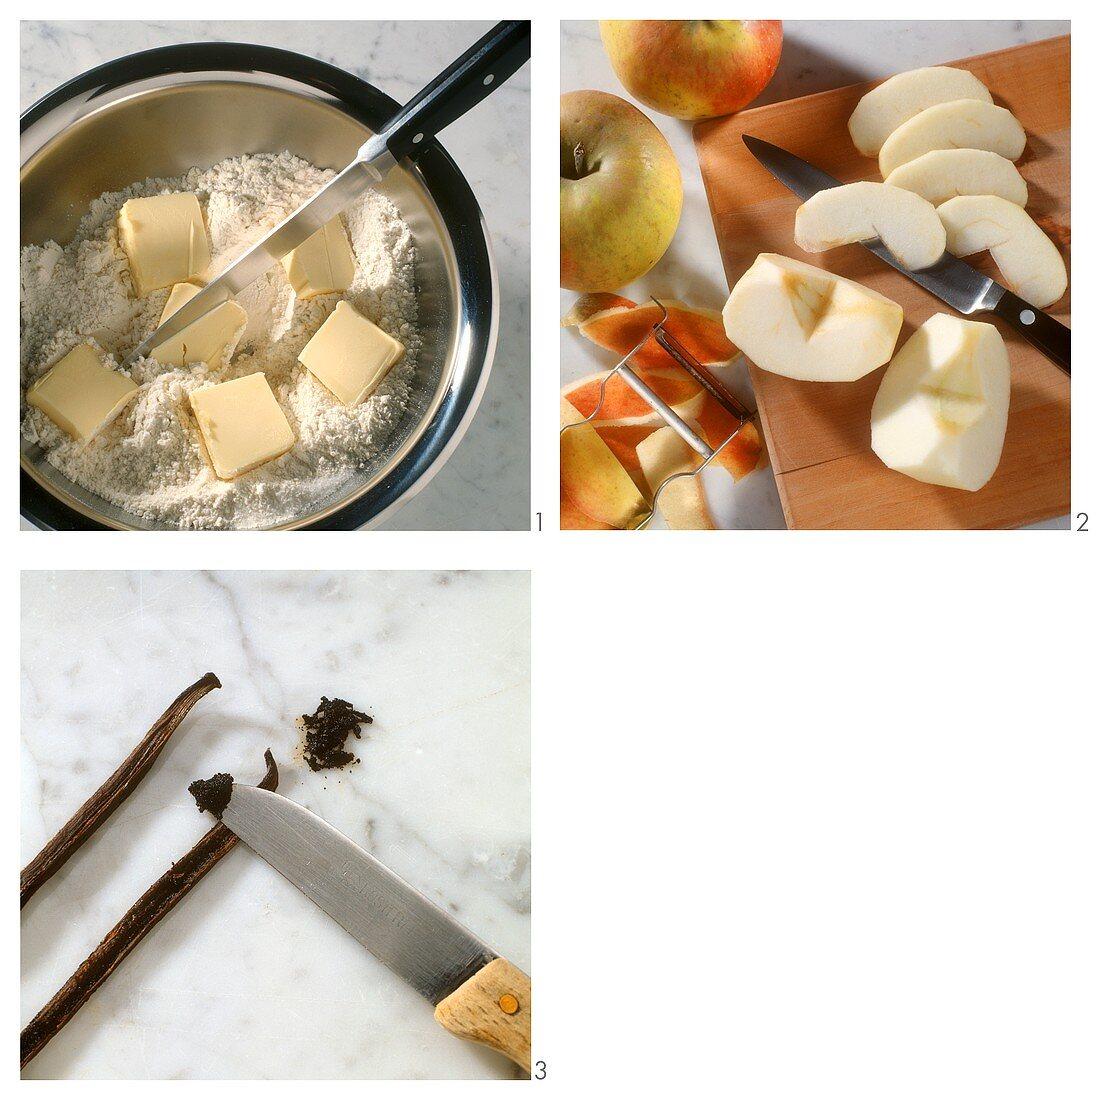 Preparing apple brulee with vanilla sauce